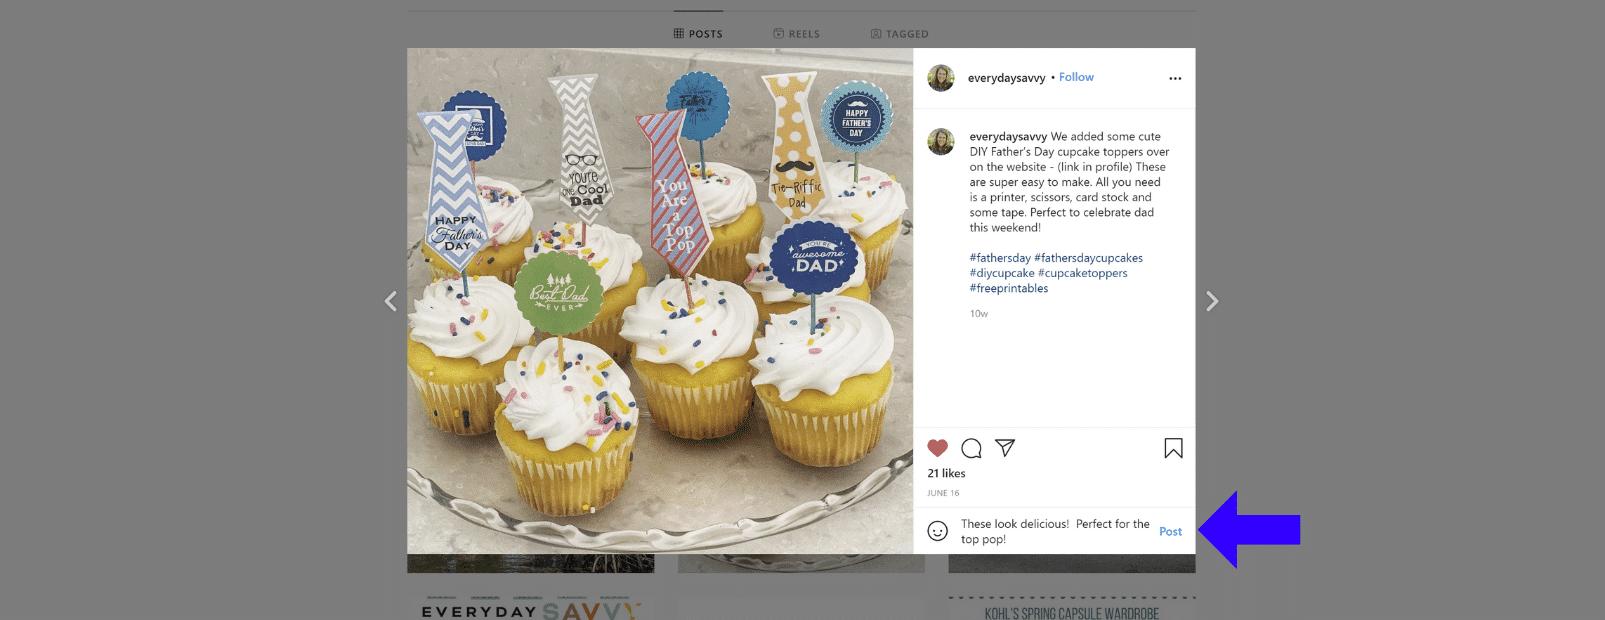 Step 4 - Engage on Social Media - Referazon